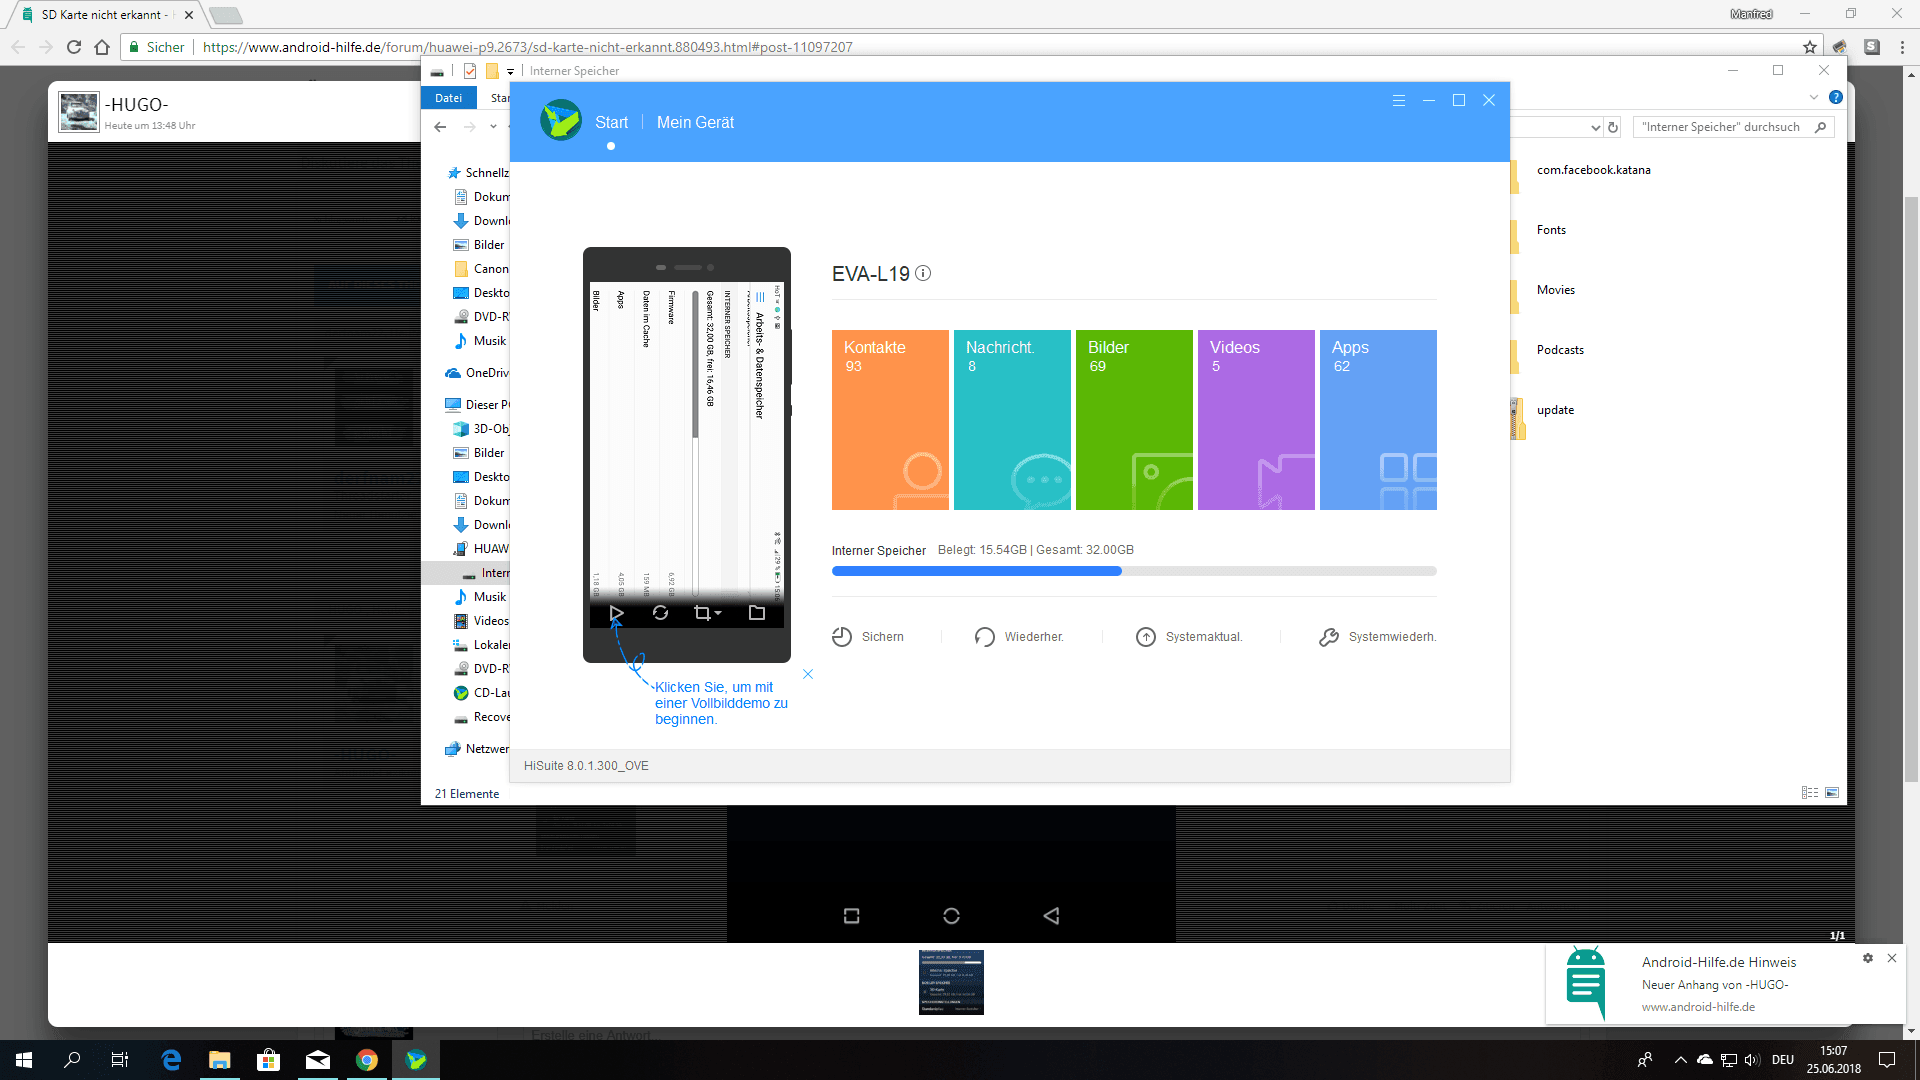 Sd Karte Wird Nicht Erkannt Pc.Sd Karte Nicht Erkannt Huawei P9 Forum Android Hilfe De